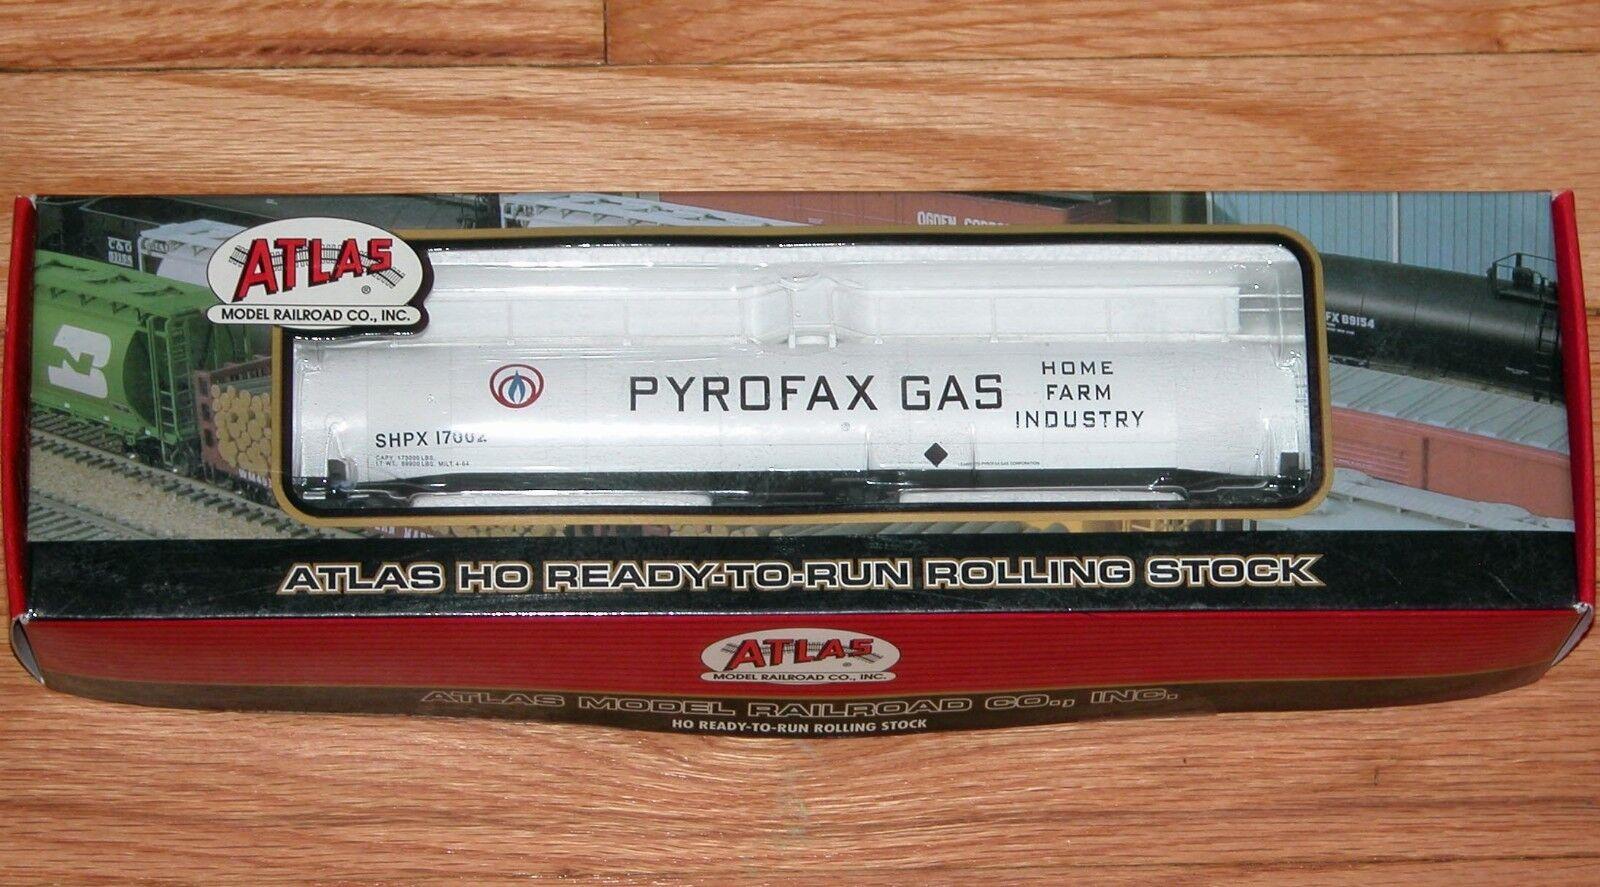 ATLAS 1728-6 33,000 GALLON TANK CAR PYROFAX GAS GAS GAS SHPX 17002 0fab5b